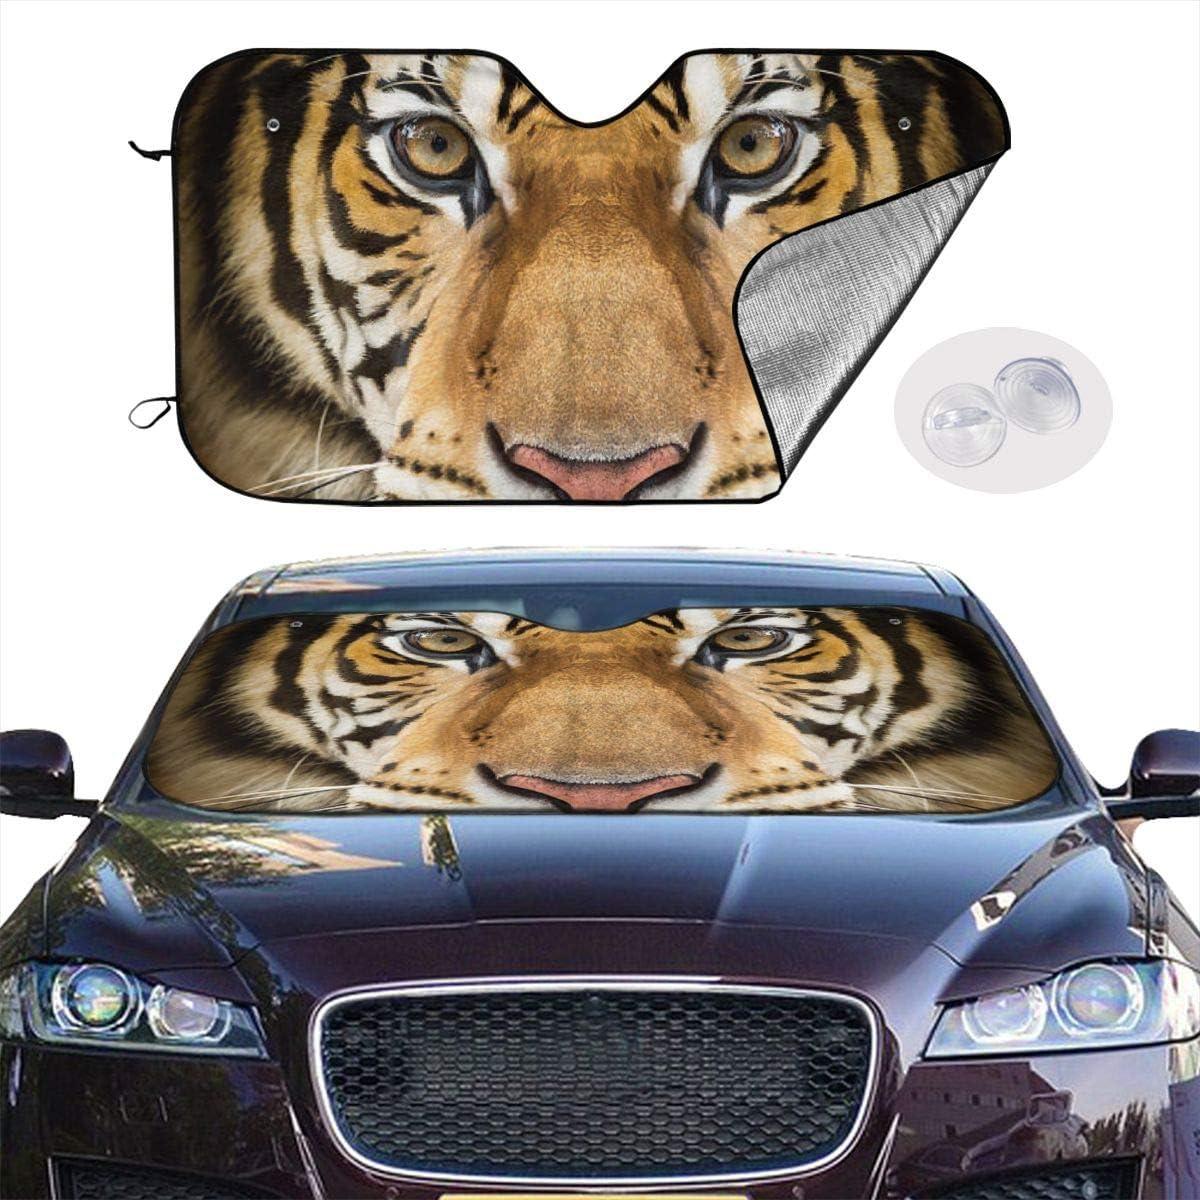 Cool Tiger Eye Face Animal Themed Interior Windshield Sun Shade Cover Car Windows Visor Kit Ornament Decor Outdoor Vehicle Accessories Sunshade Auto for Women Men